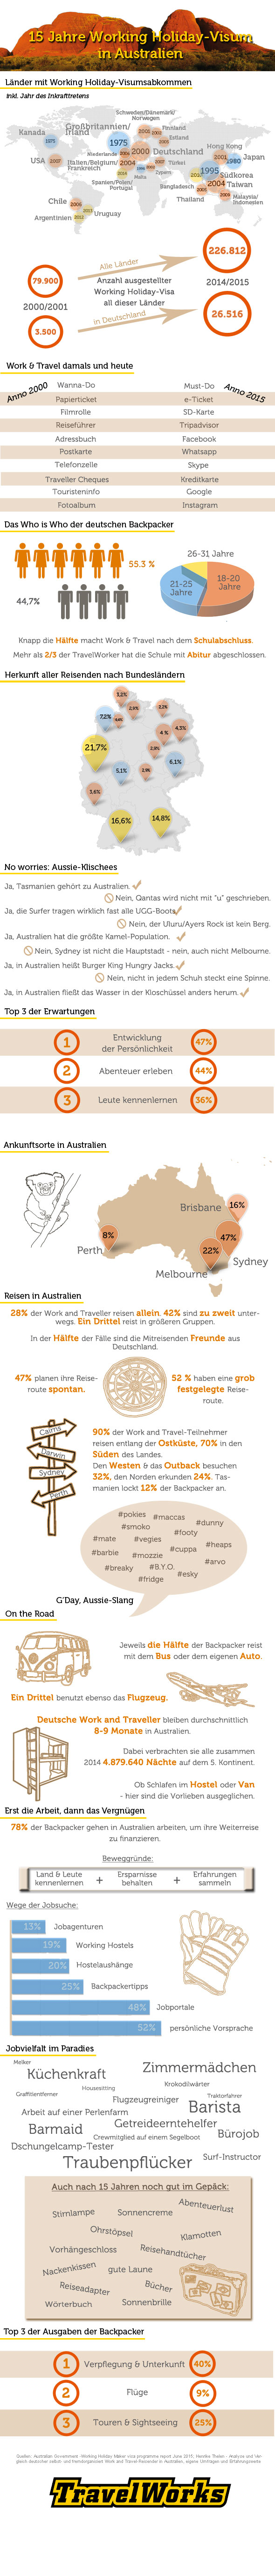 Work and Travel Australien: Infografik - 15 Jahre WHV Australien